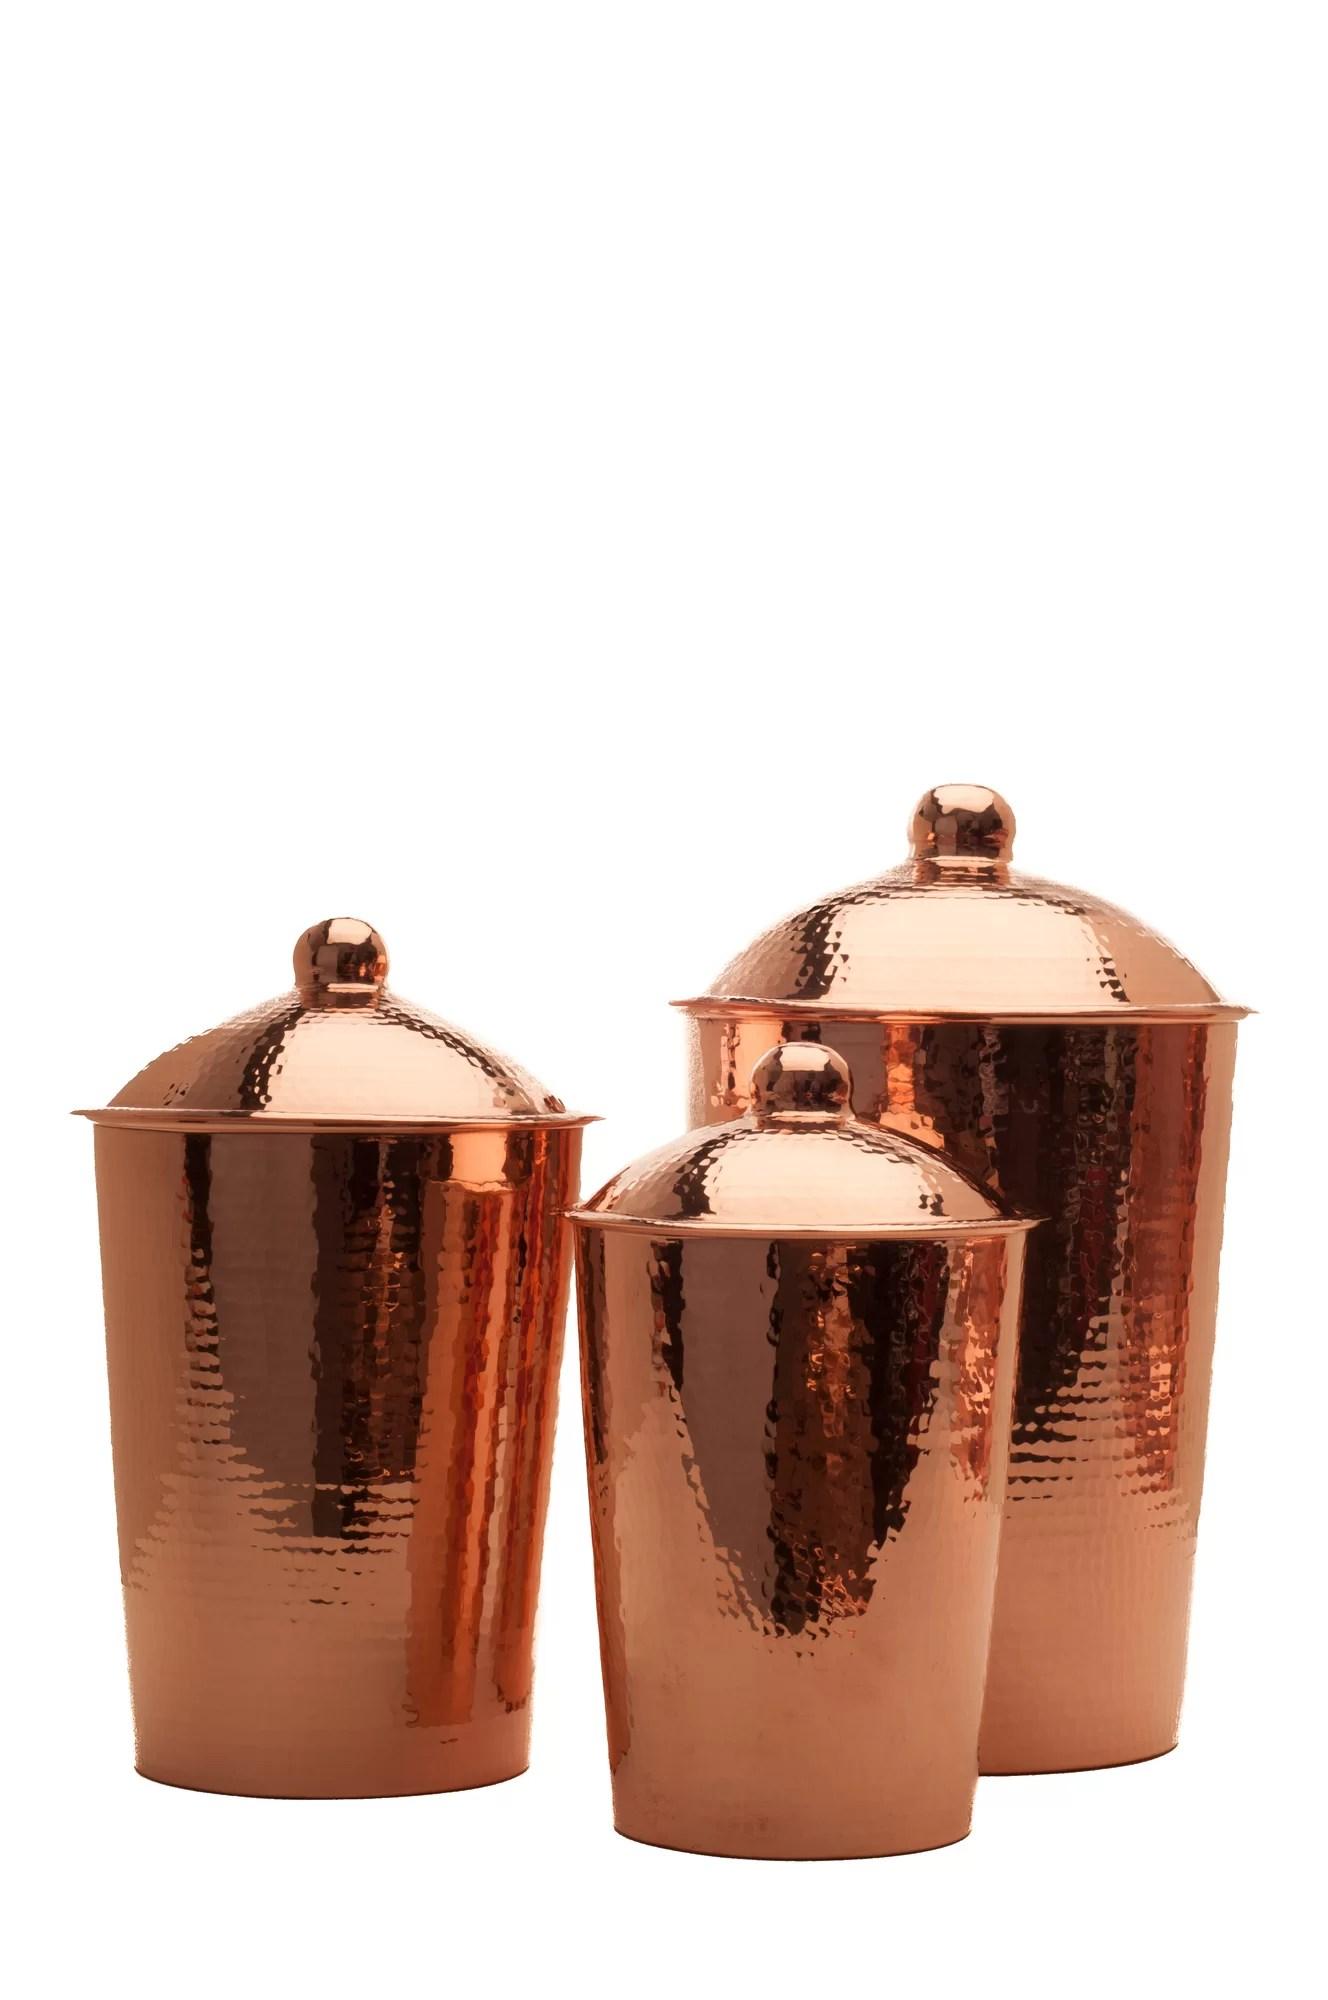 3 piece kitchen set trolley sertodo copper kumran canister ebay